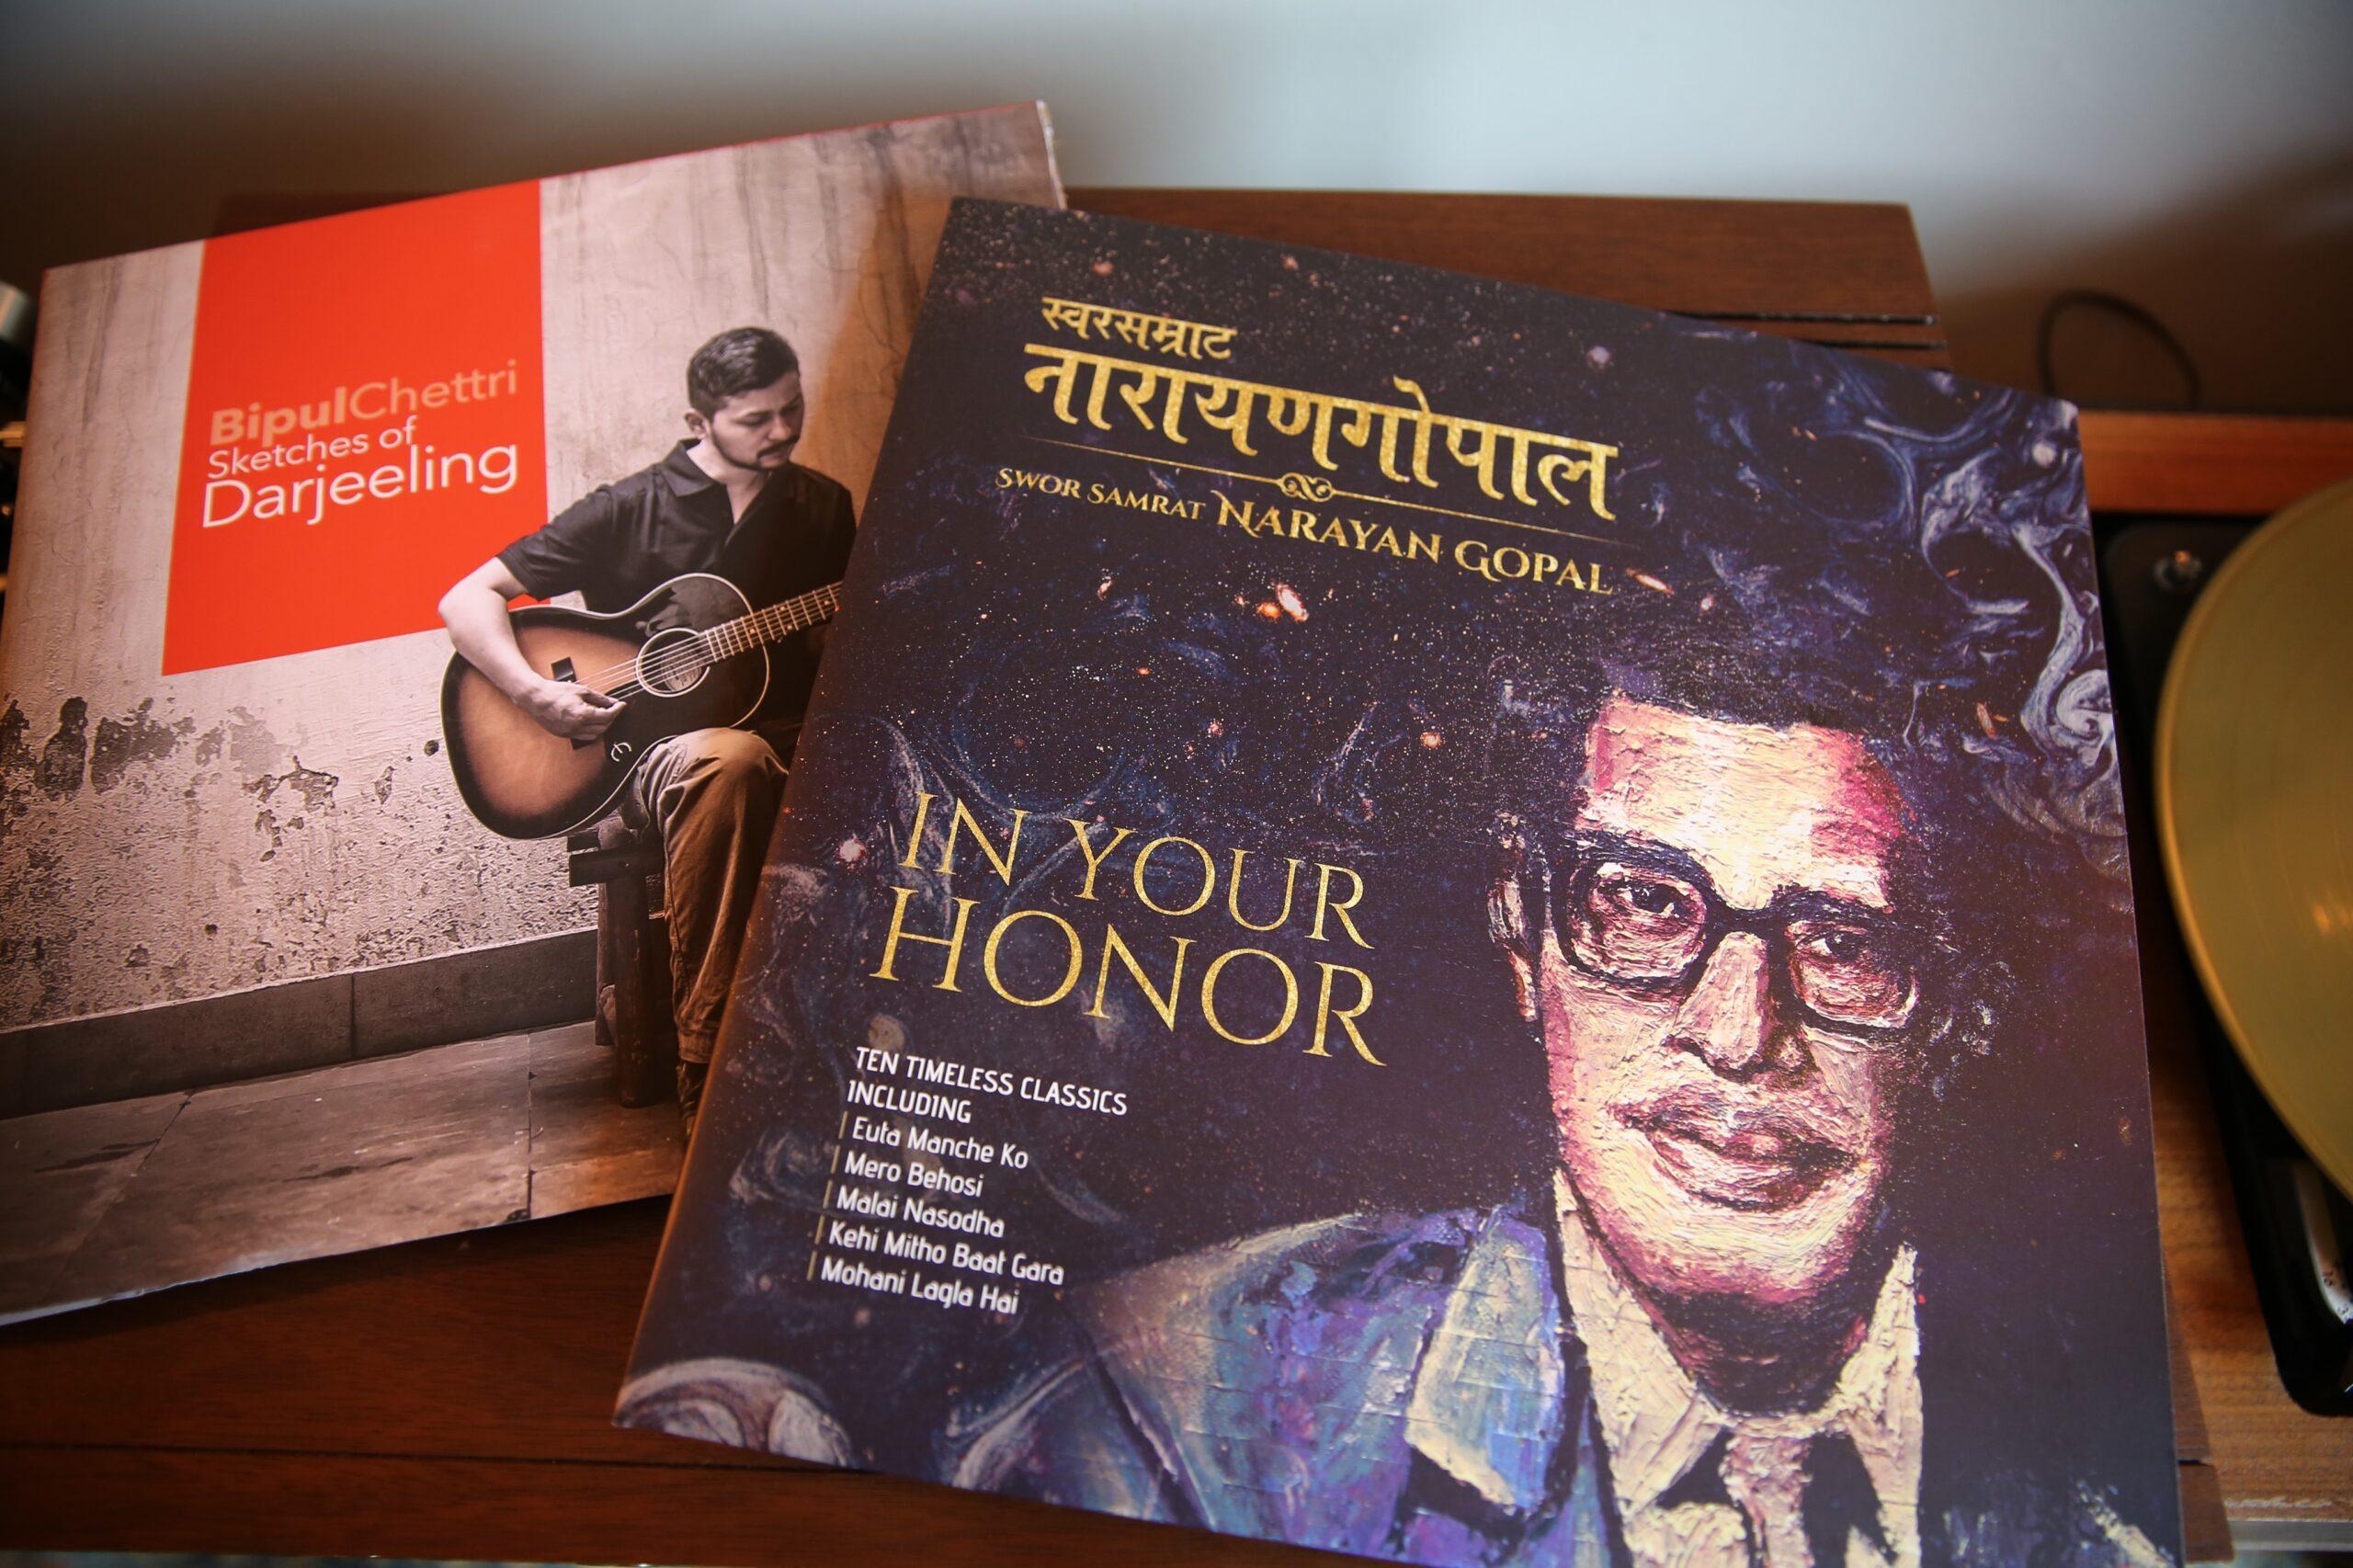 Narayan Gopal and Bipul Chettri Bundle